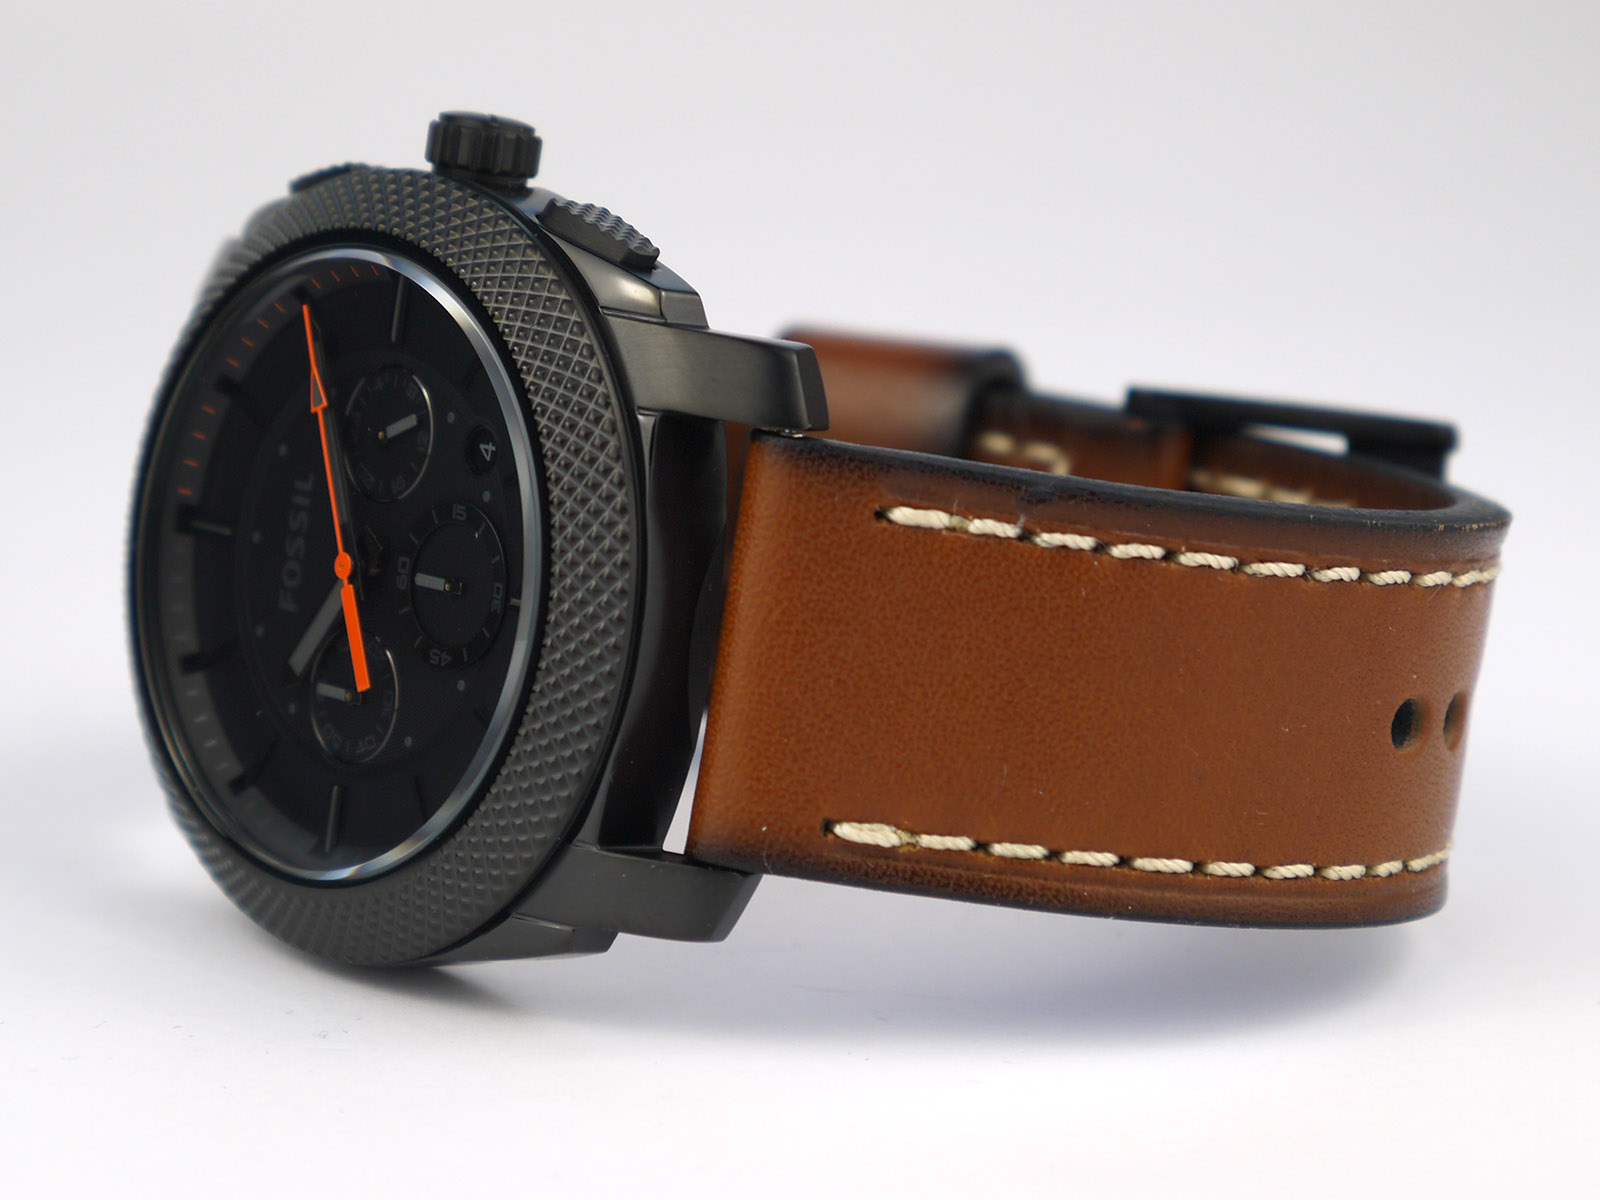 17af96e07 Fossil FS5234 Machine Watch ⋆ High Quality Watch Gallery